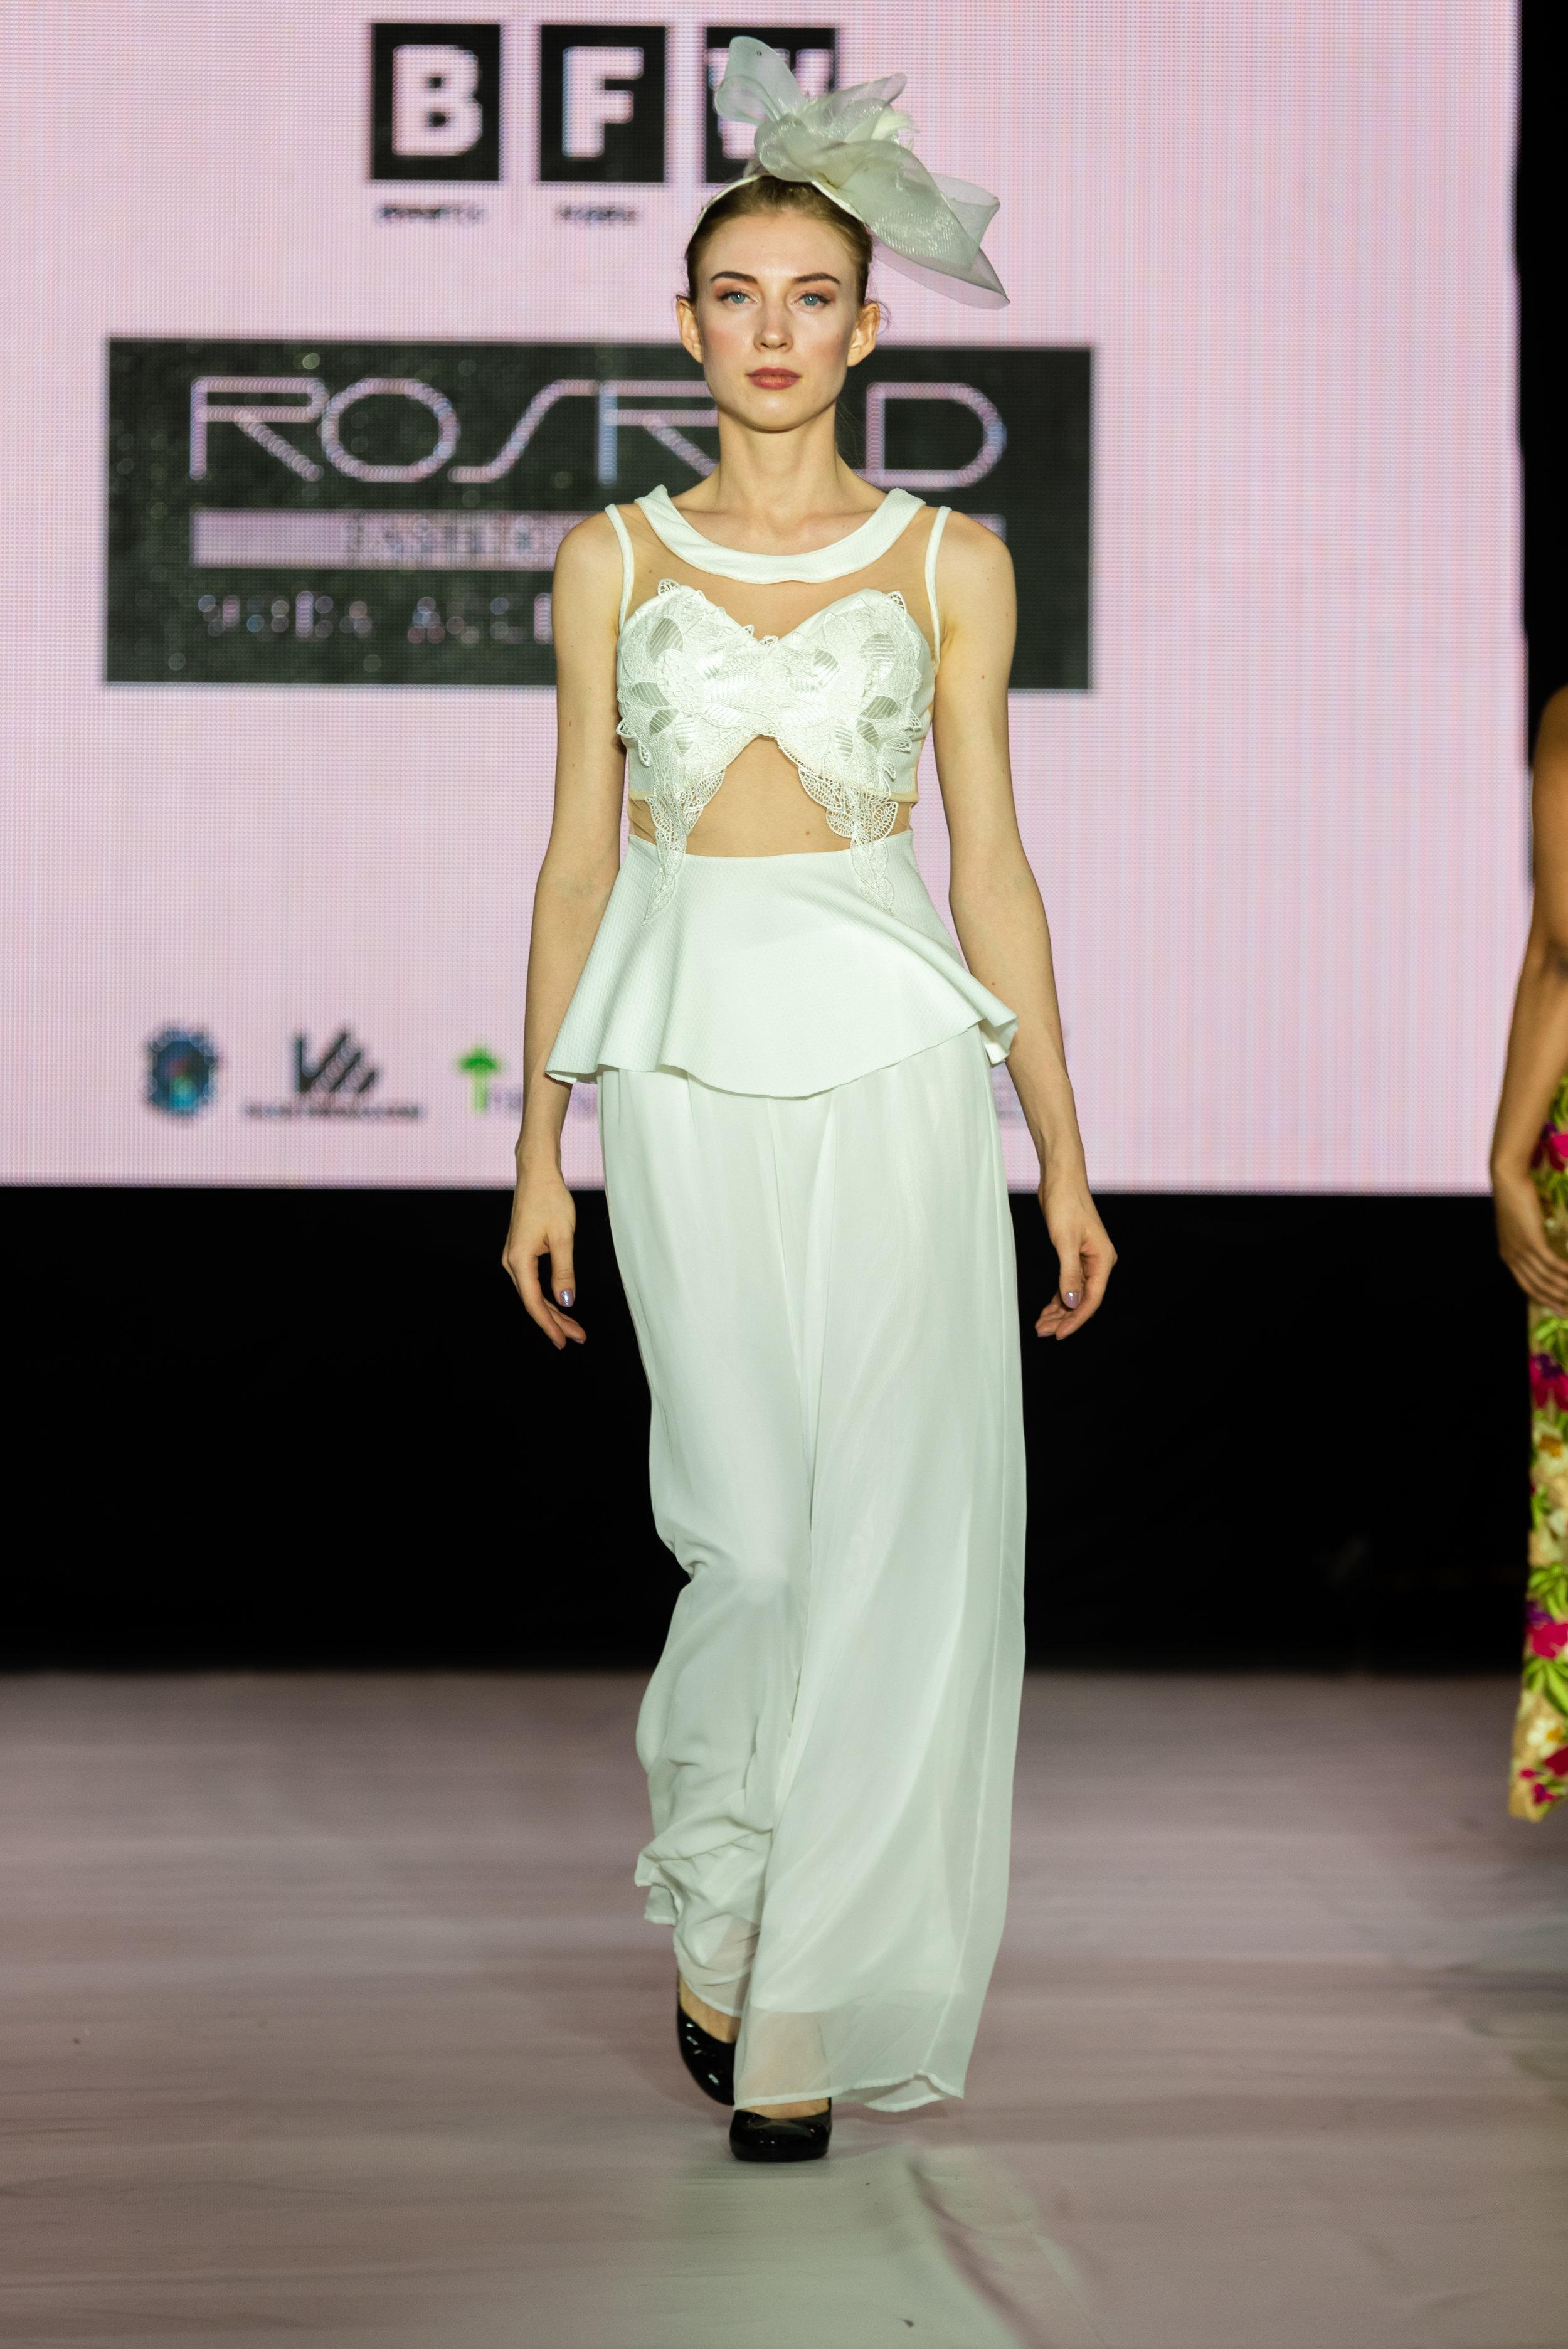 BFW10 - Rosred Fashion Design-SKN_5056.jpg